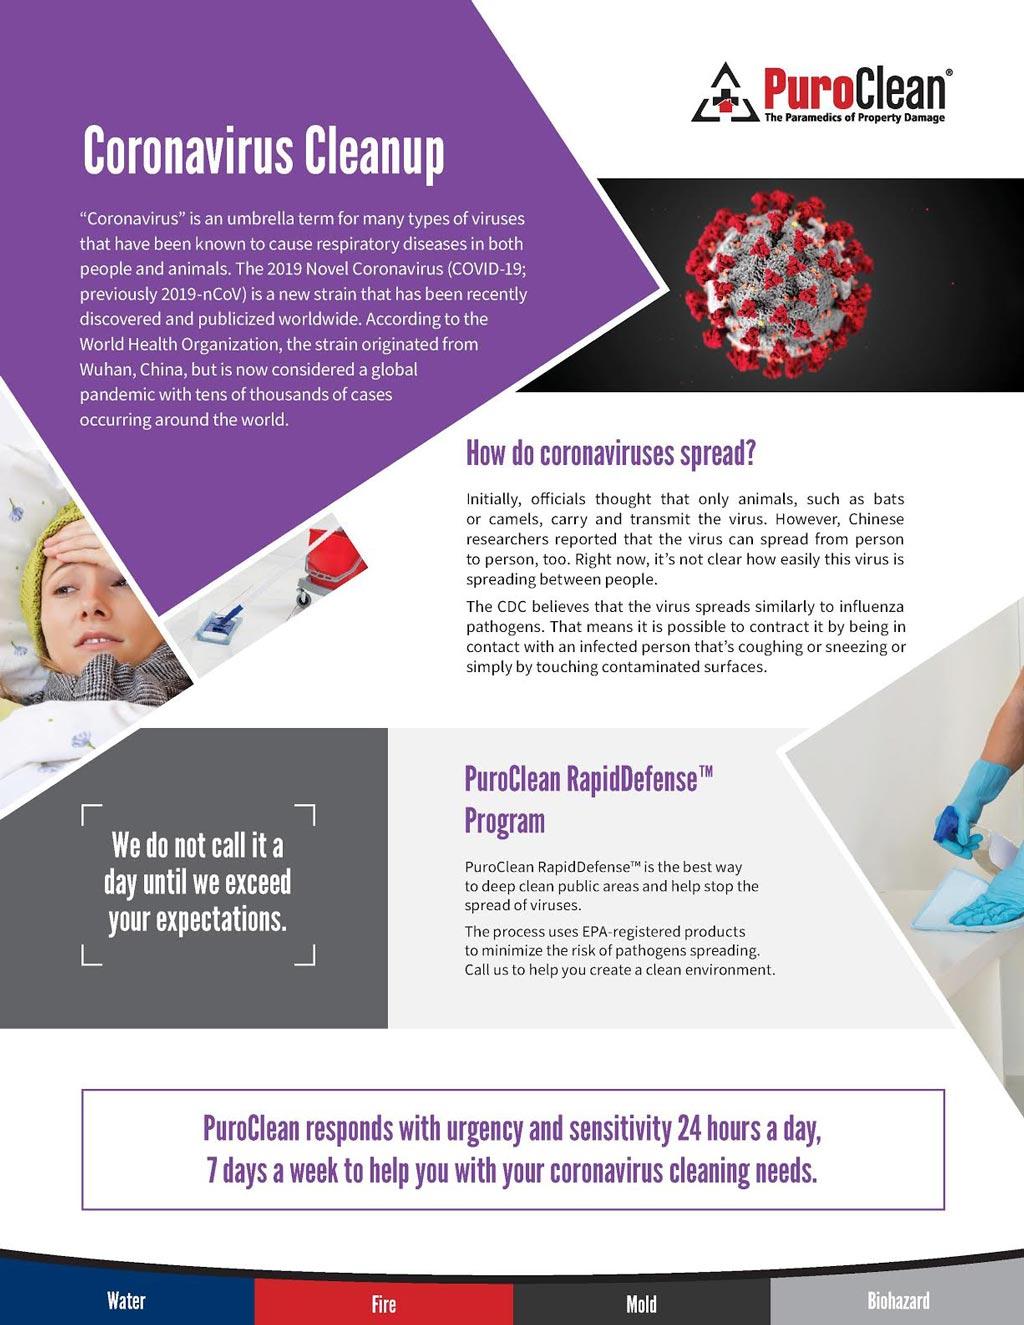 coronavirus cleanup services